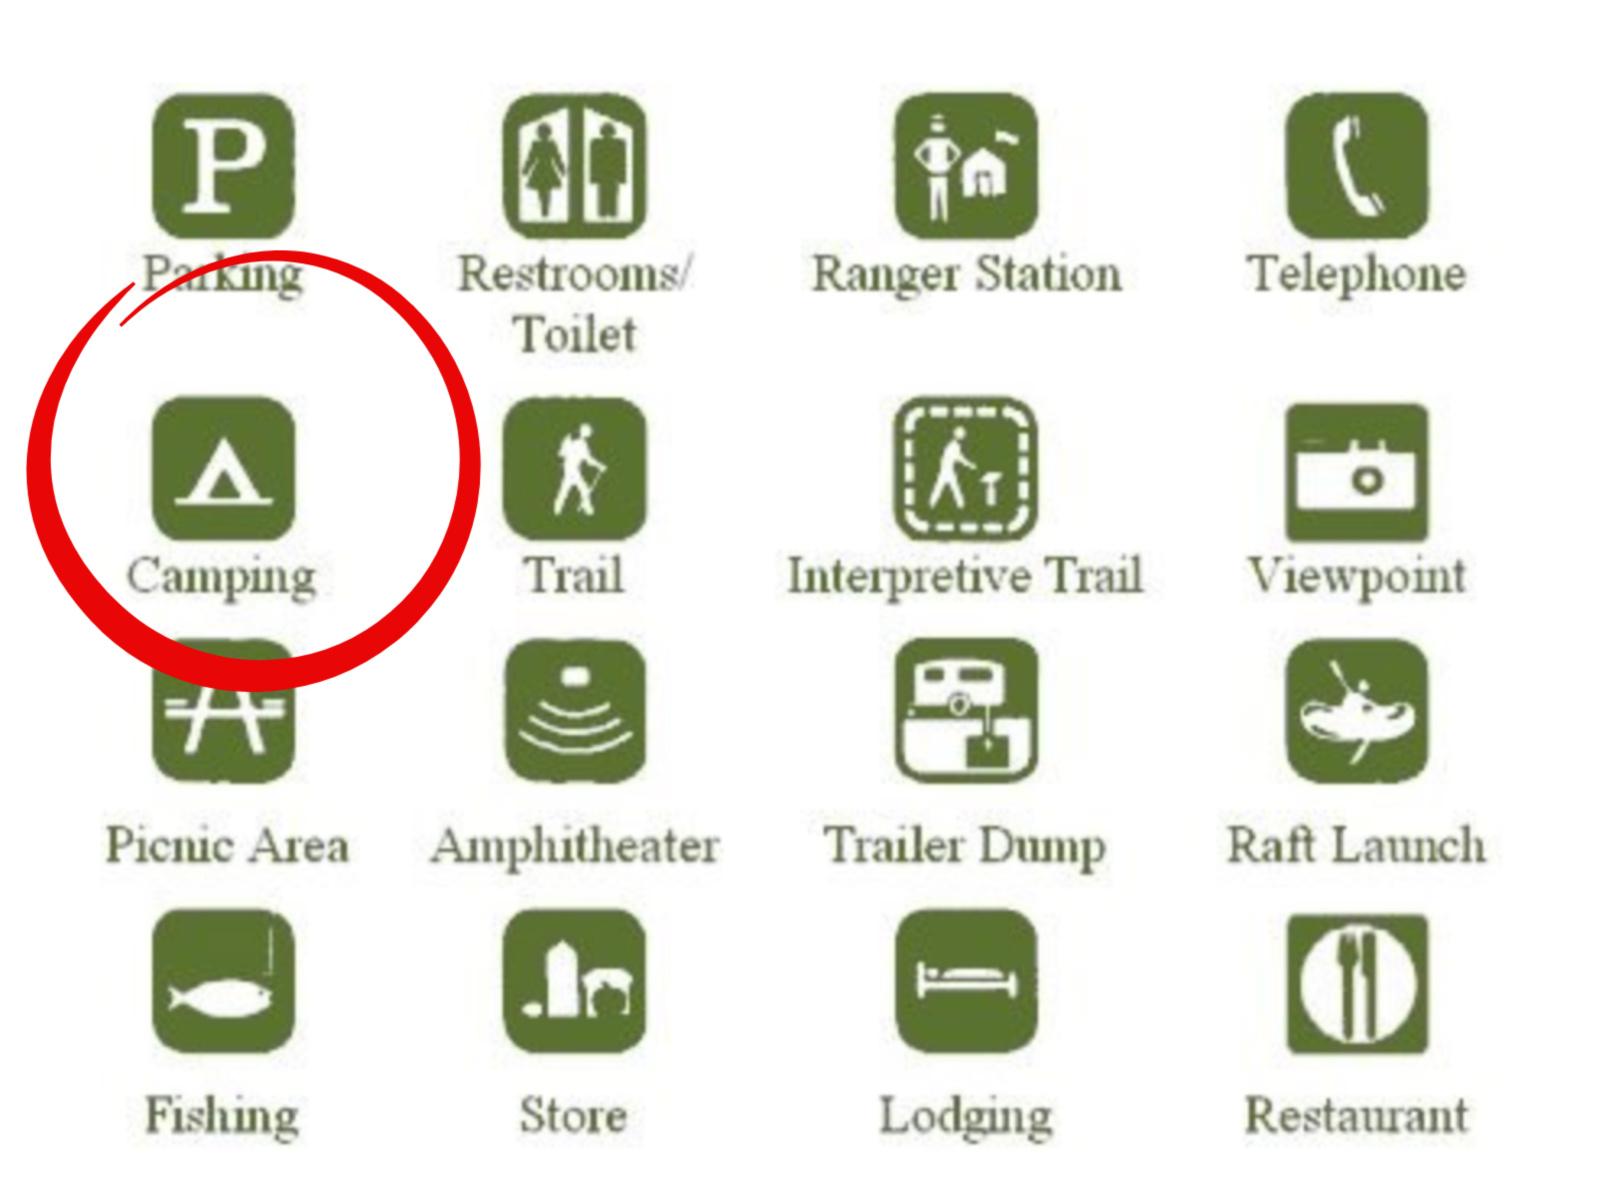 Image courtesy National Parks Service: https://www.nps.gov/noca/planyourvisit/accessibility-symbols.htm